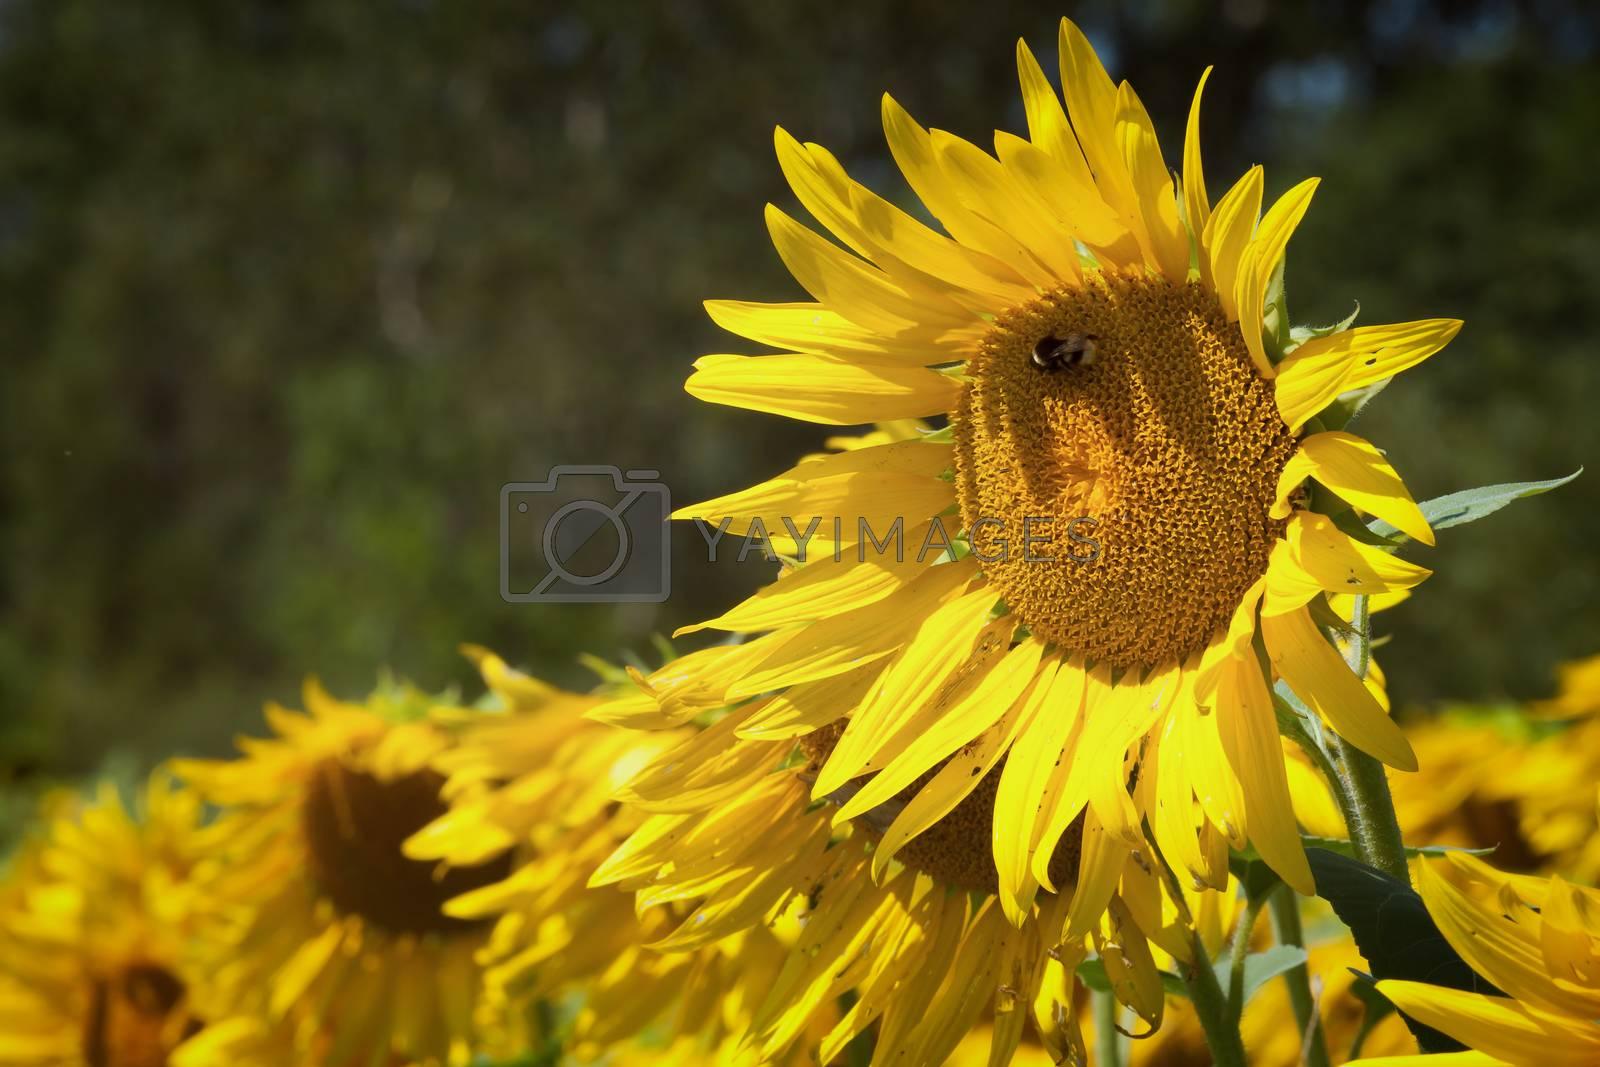 Sunflower field in summer